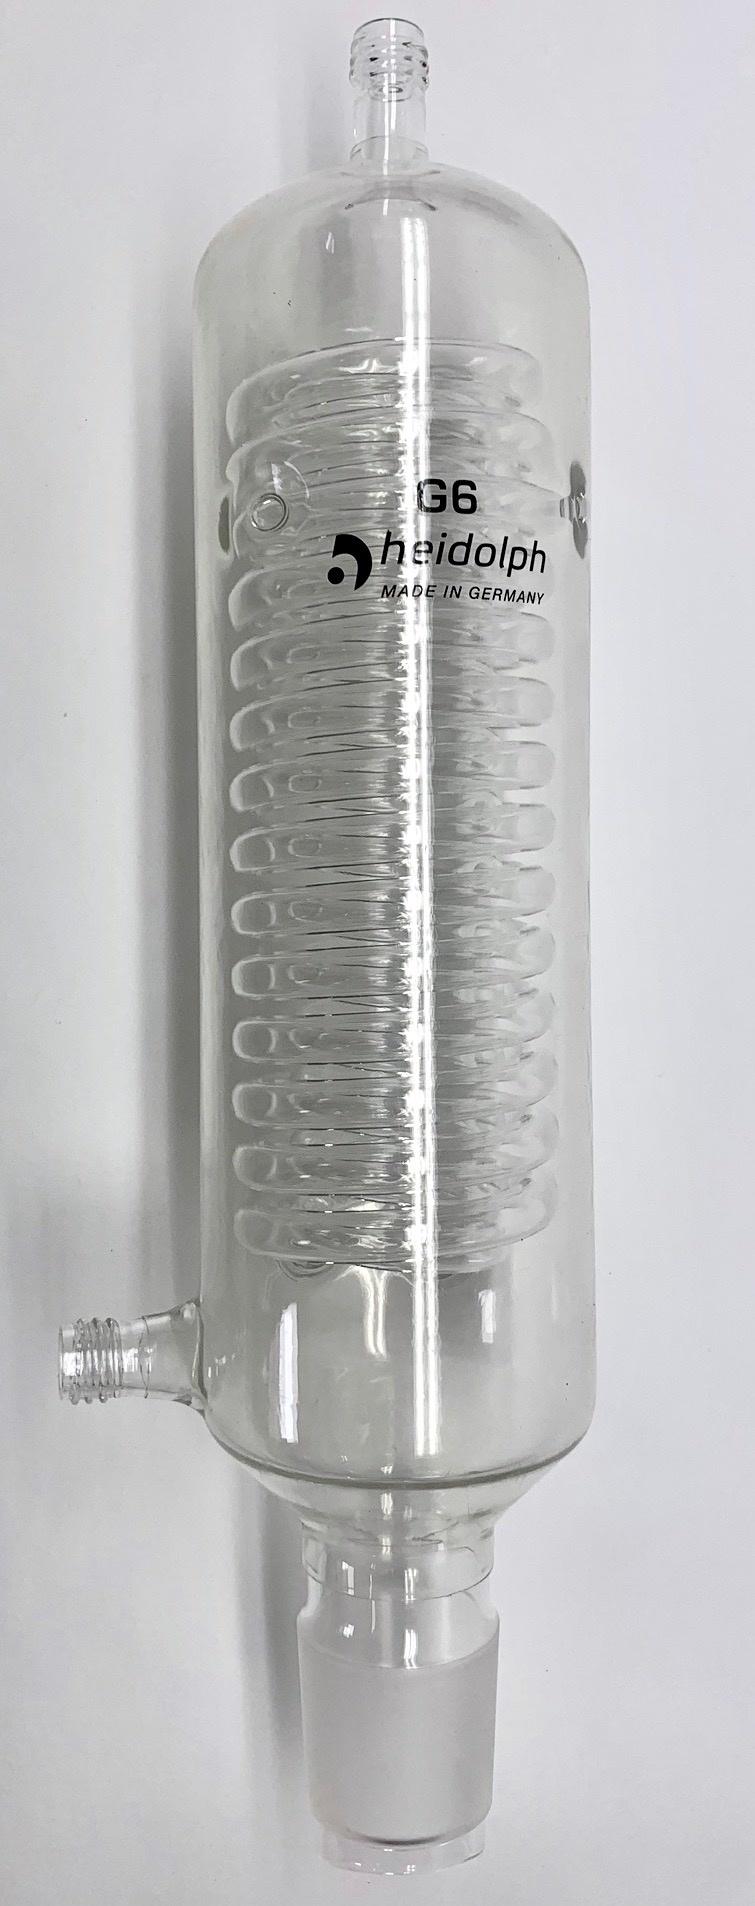 Heidolph Instruments Heidolph G6B condenser